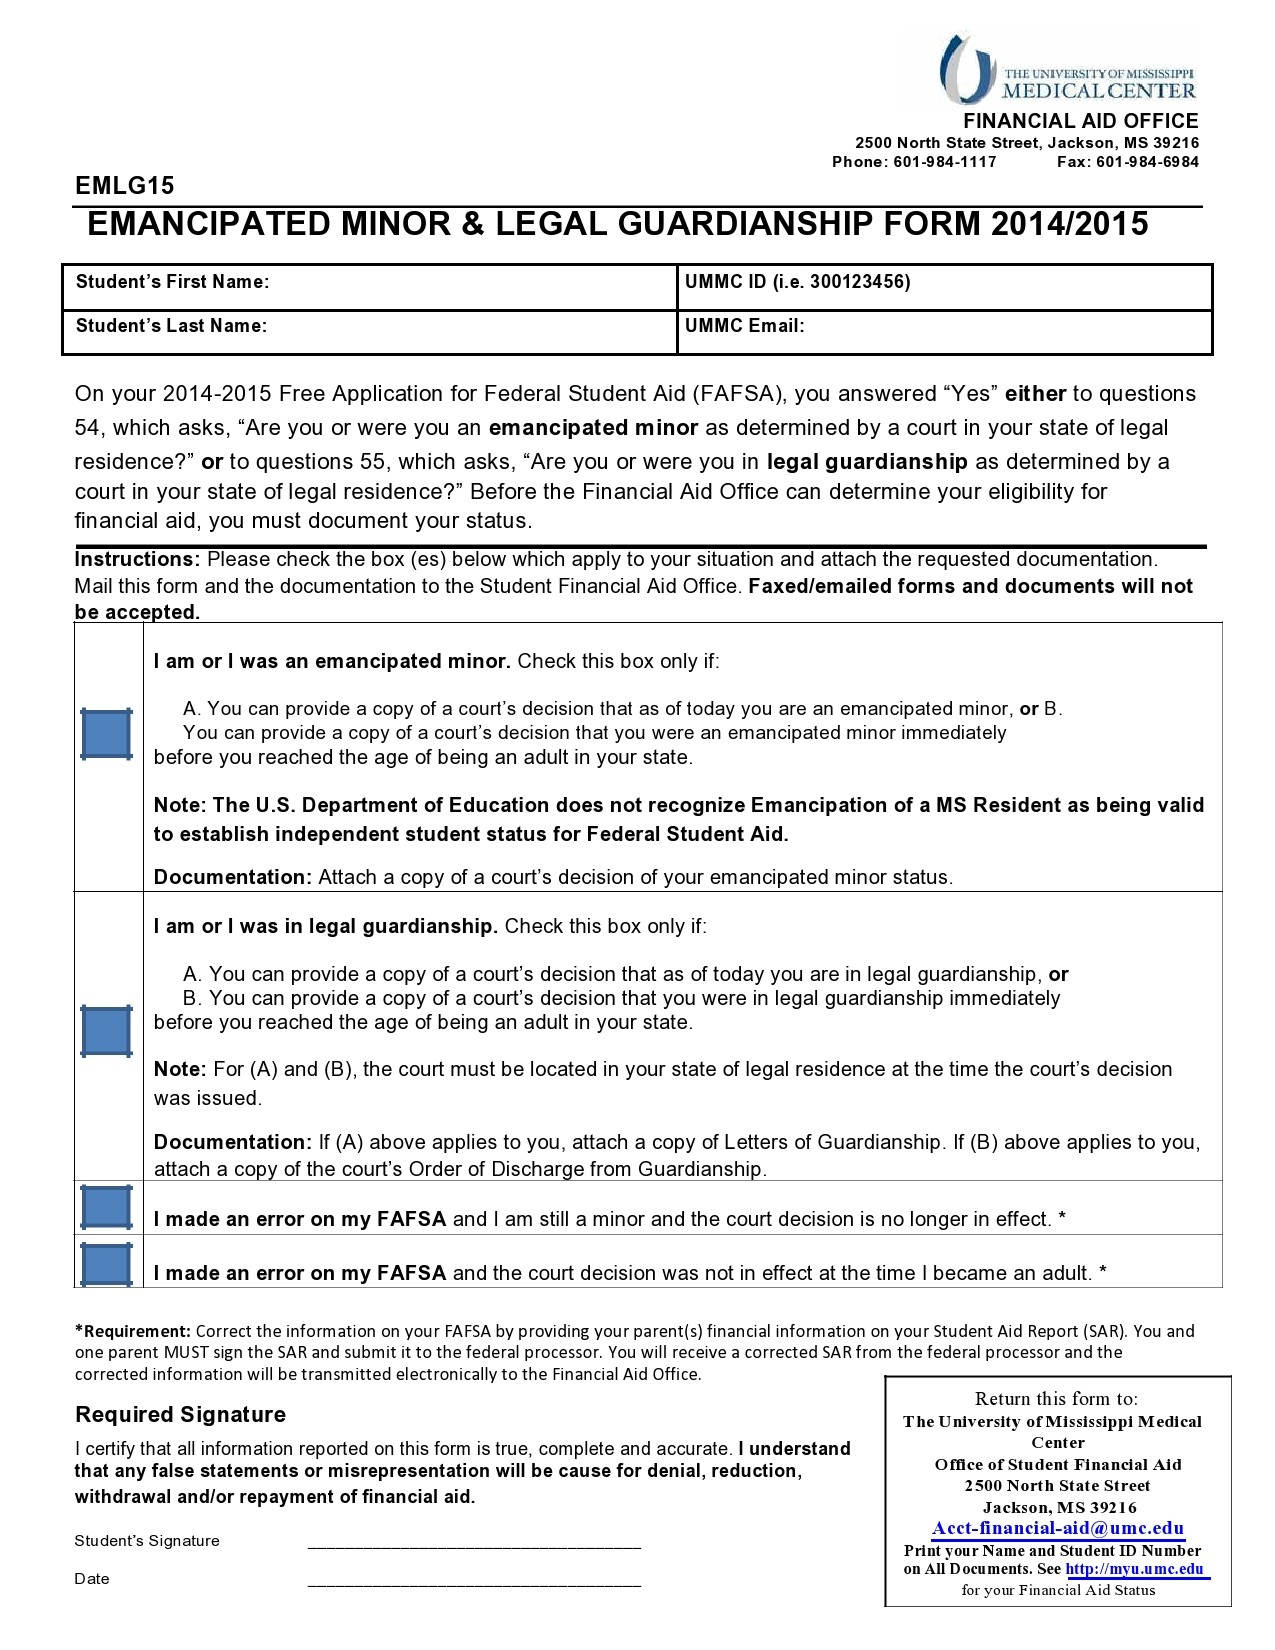 Free guardianship form 07